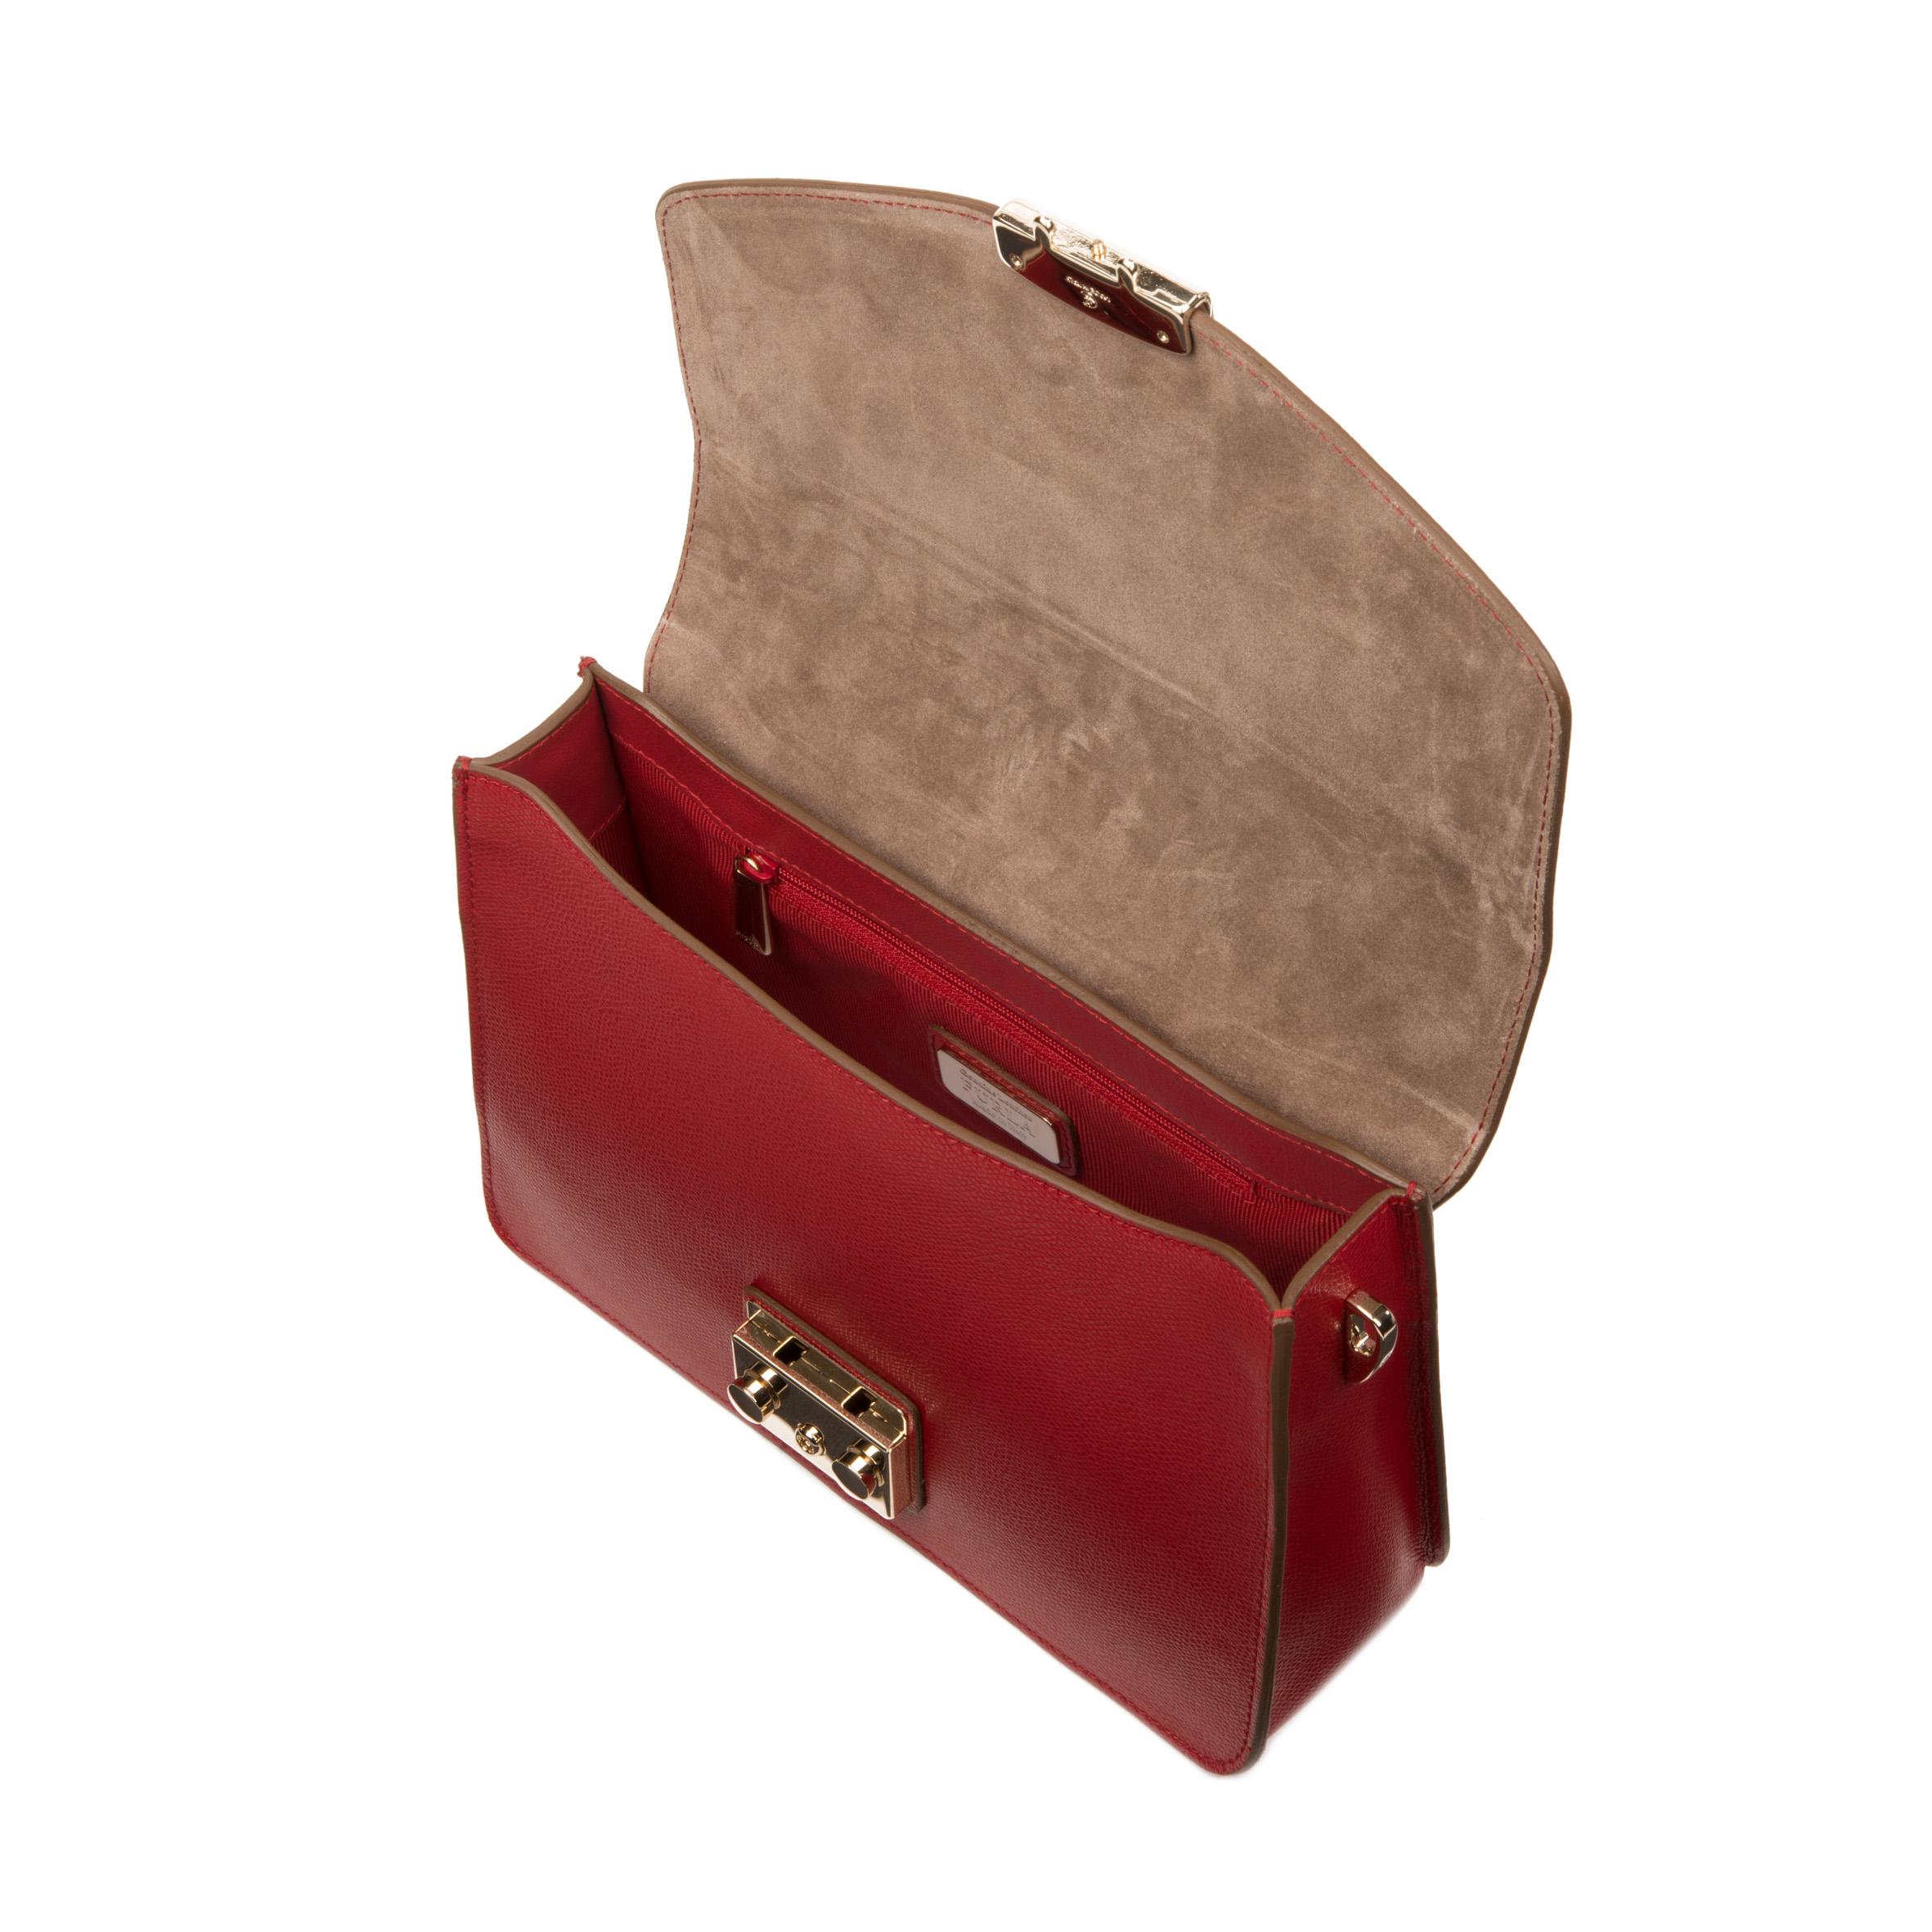 Furla Metropolis Mini Bag in Red (cabernet)